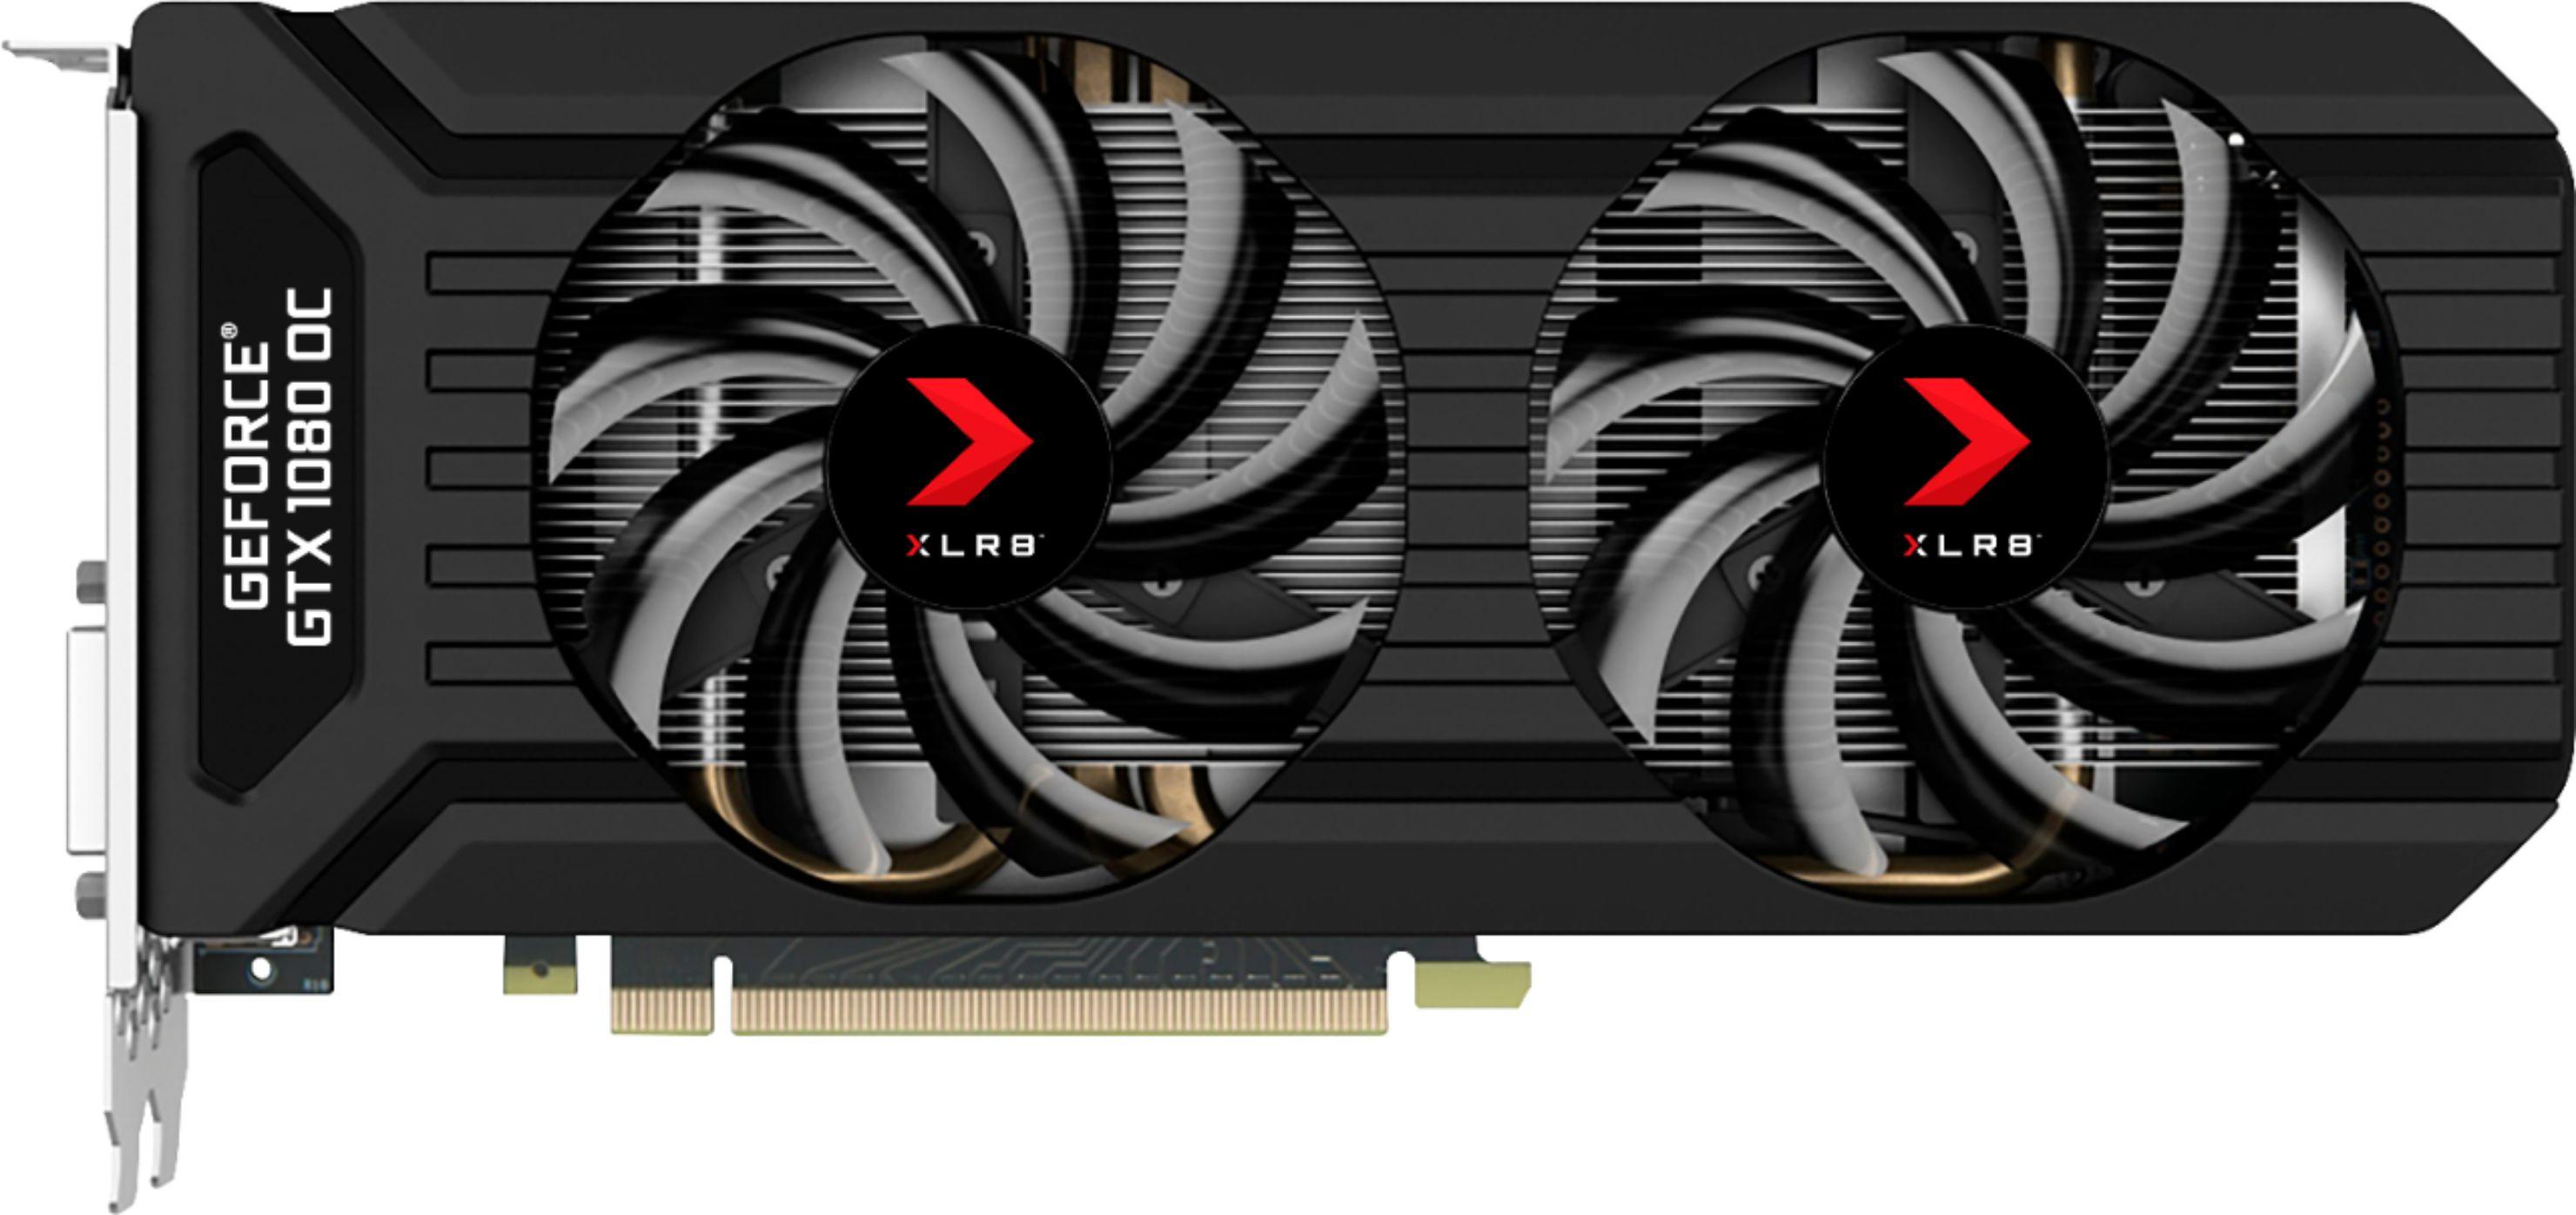 PNY NVIDIA GeForce GTX 1080 XLR8 OC GAMING Edition 8GB GDDR5X PCI Express 3.0 Graphics Card Black VCGGTX10808XGPB-OC-BB